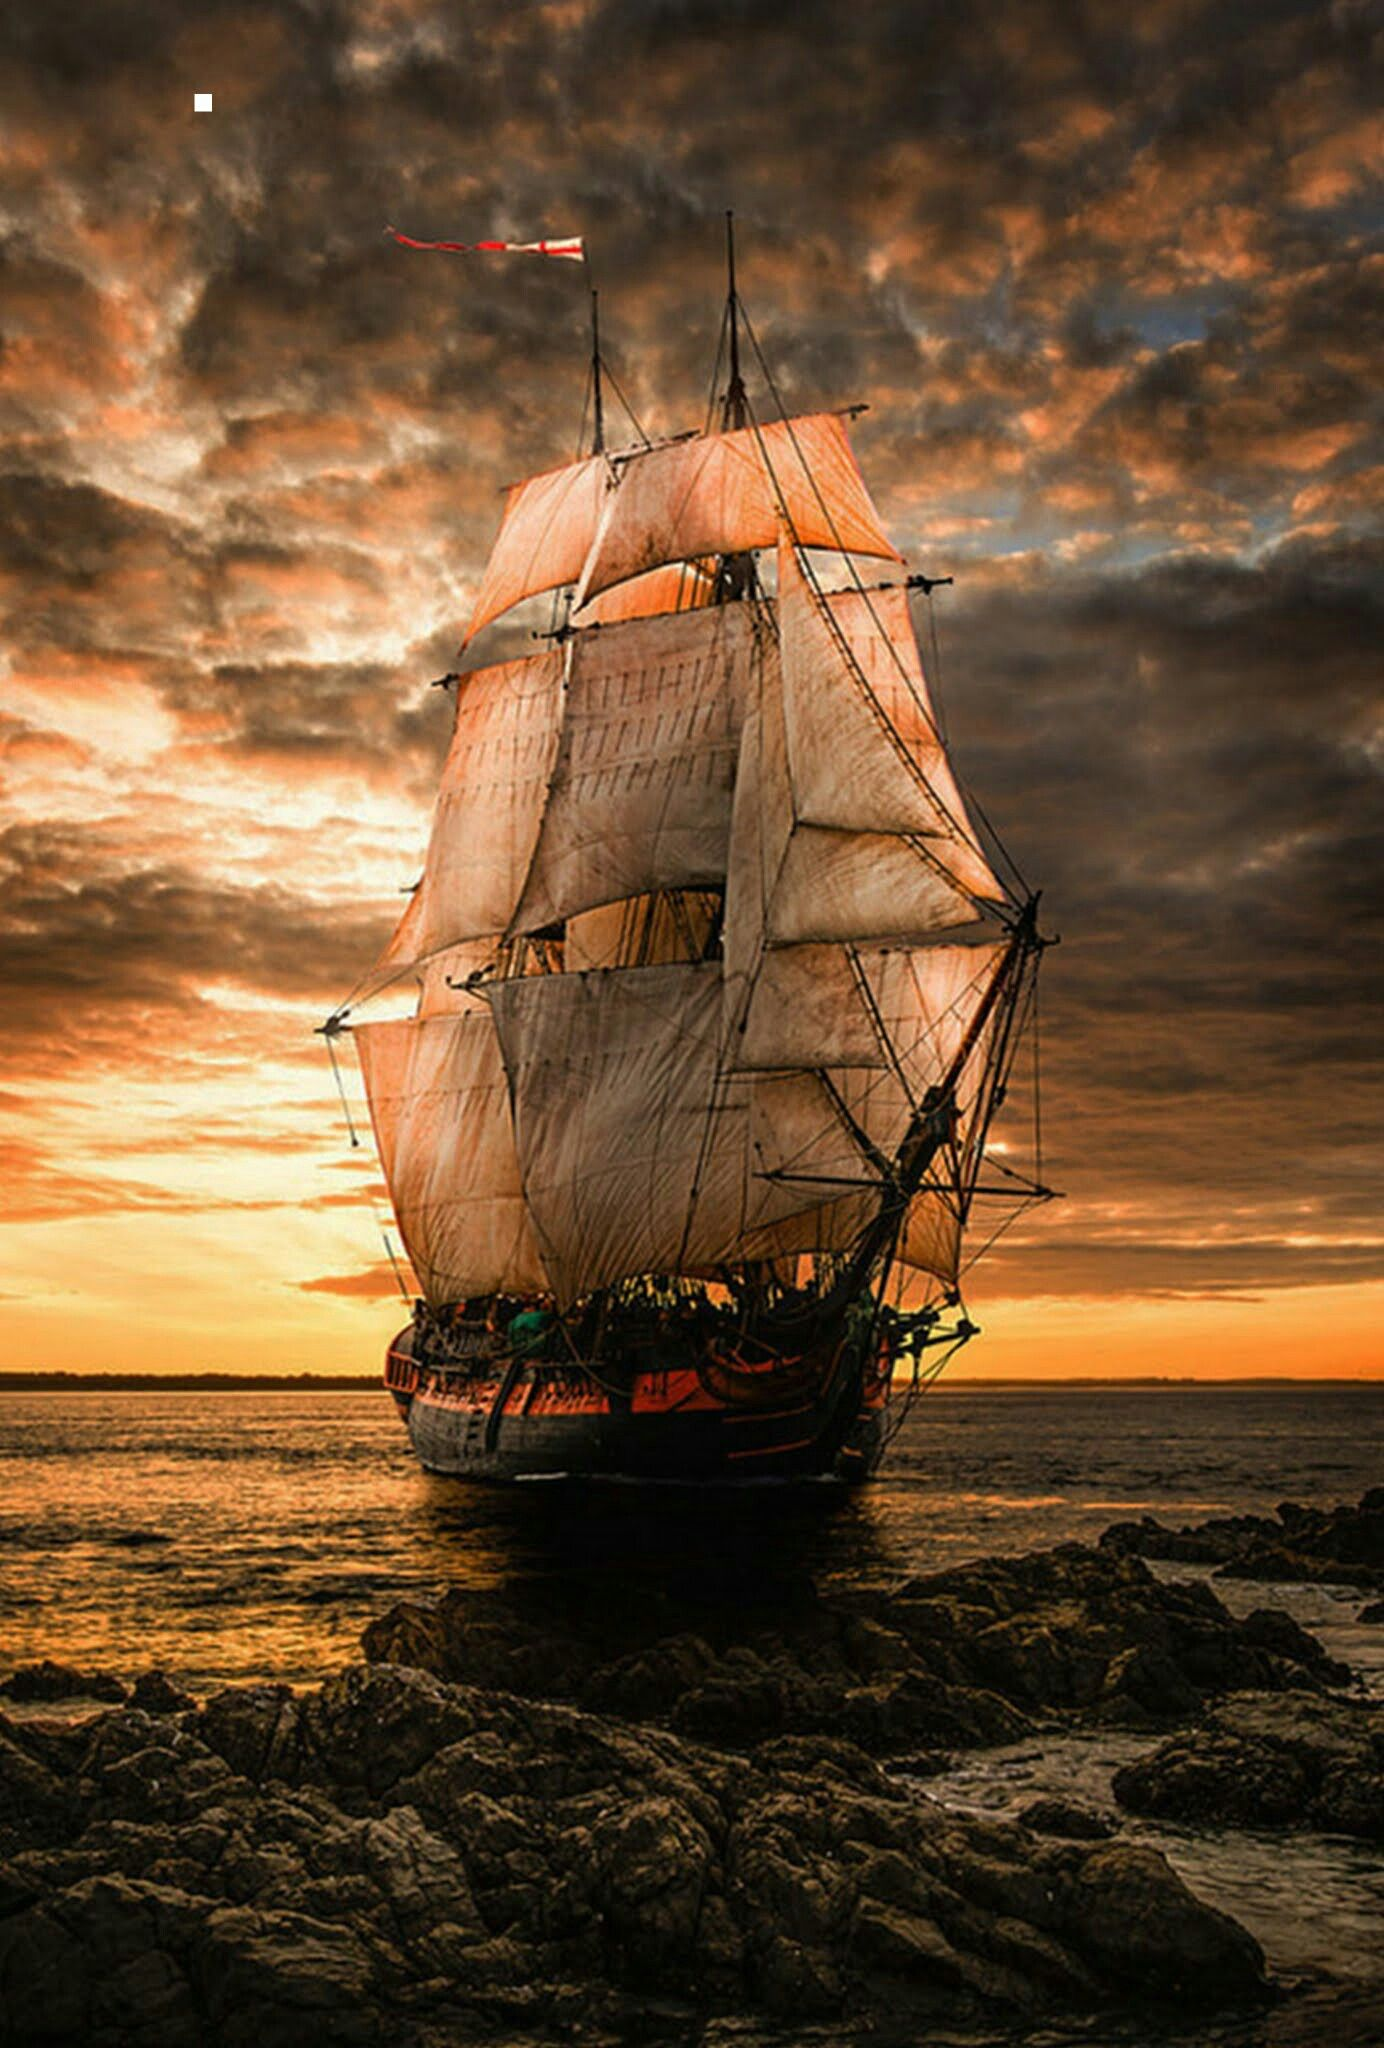 Pingl par lana blankenship sur old pirate ships - Voile bateau pirate ...